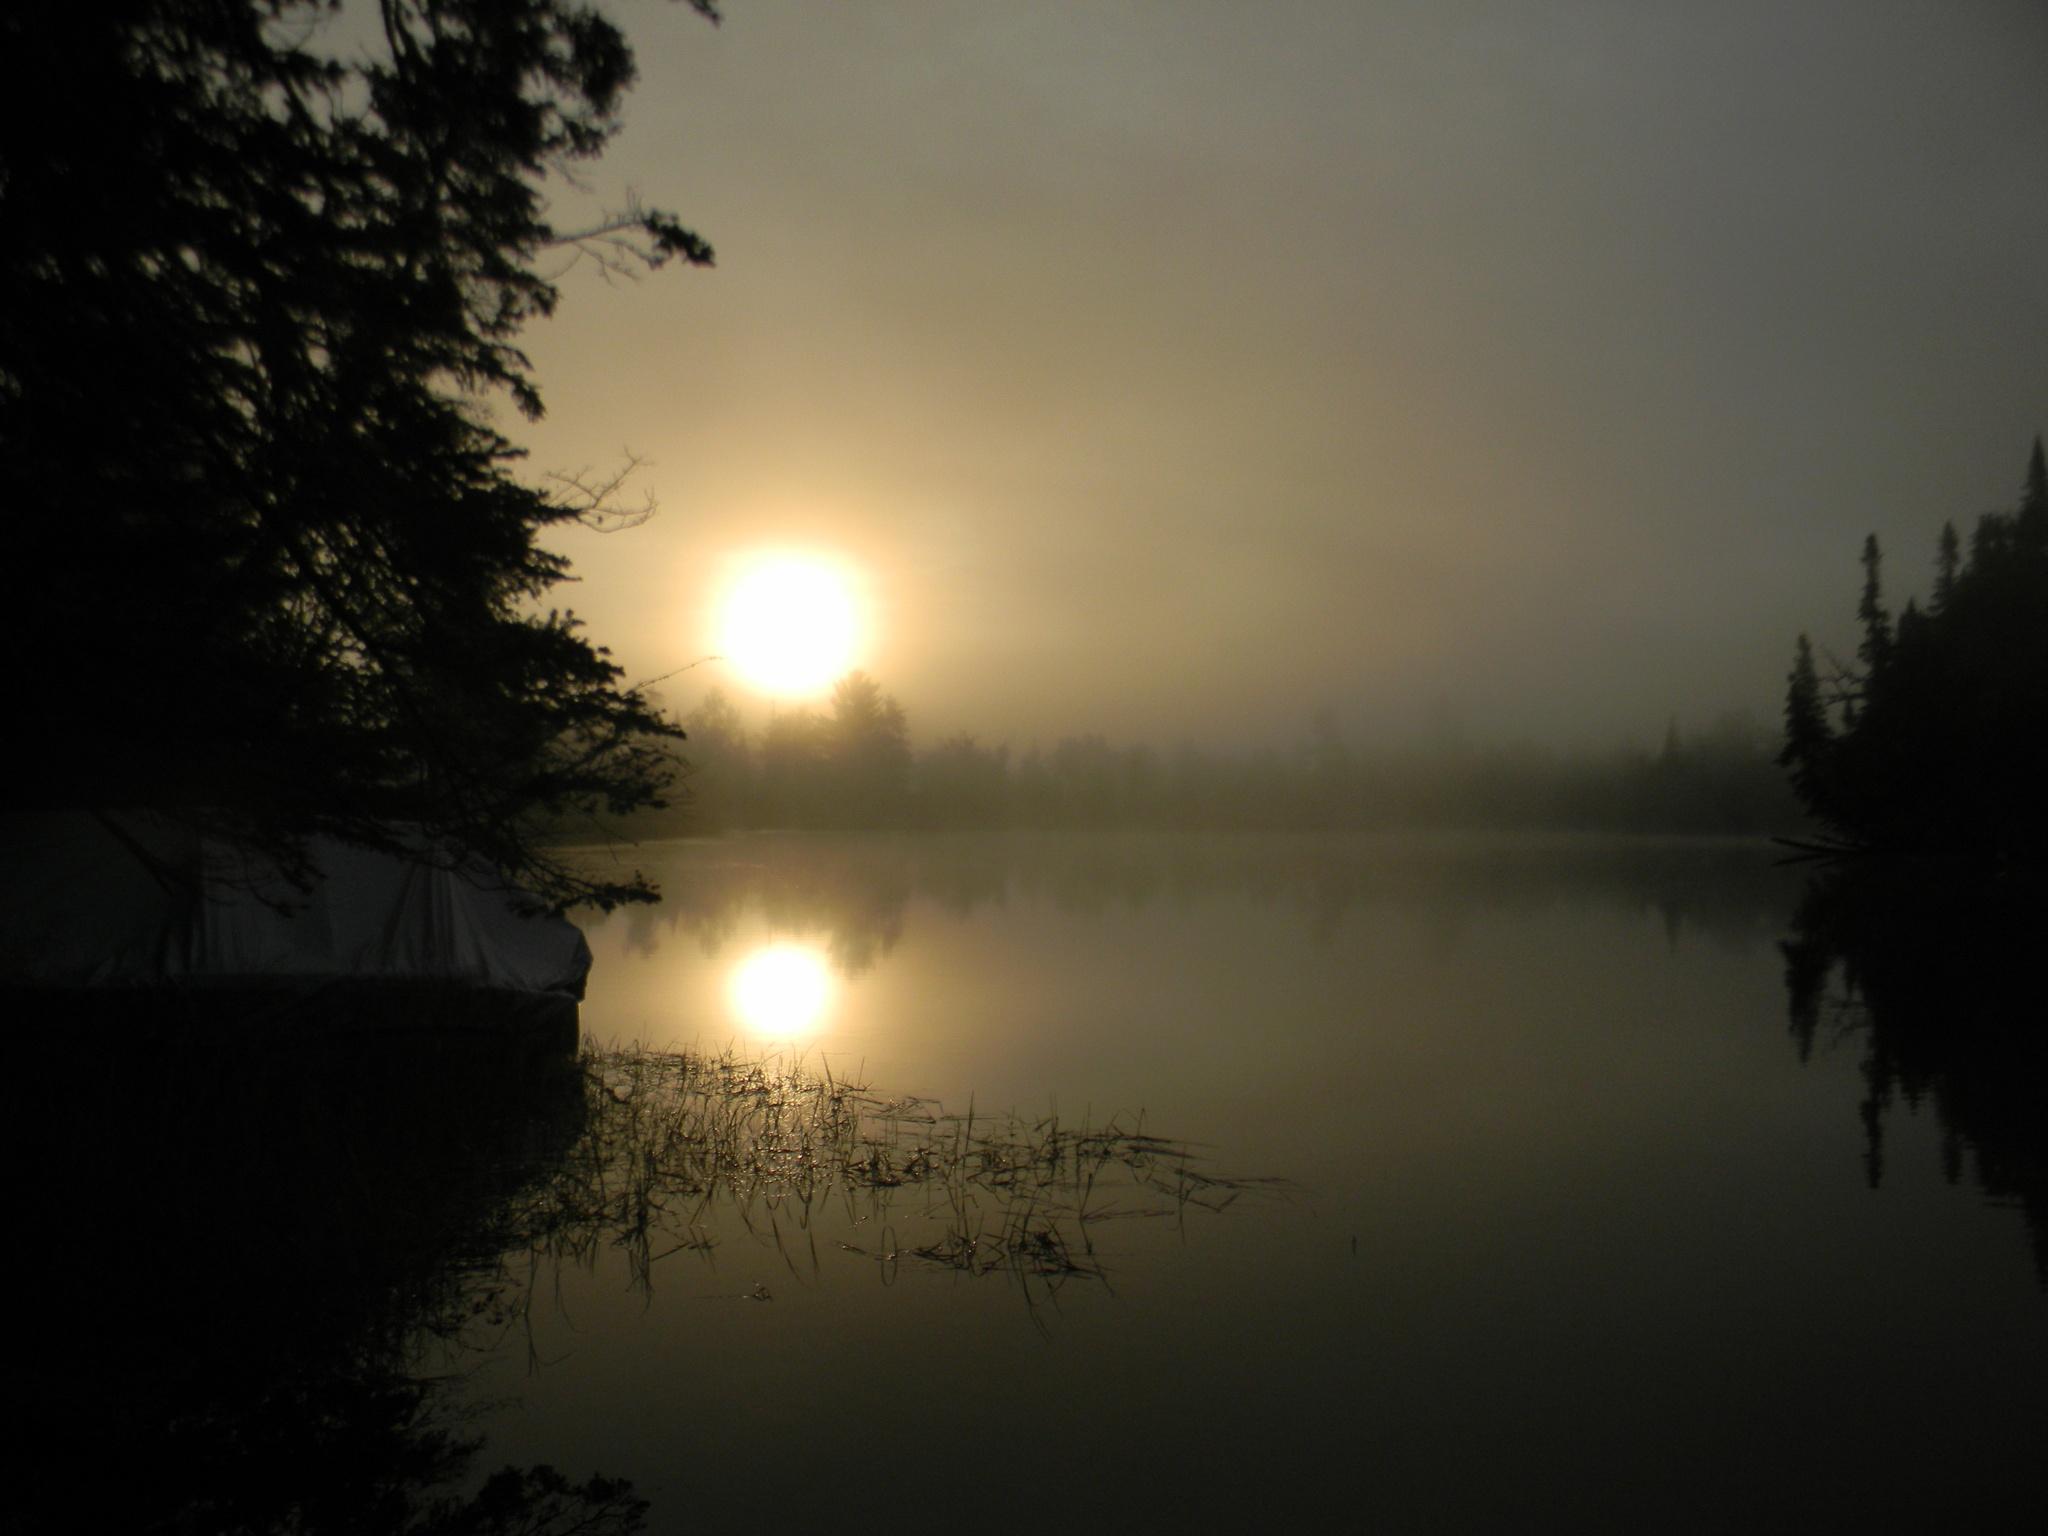 Sultry Sunrise by kbgarvey